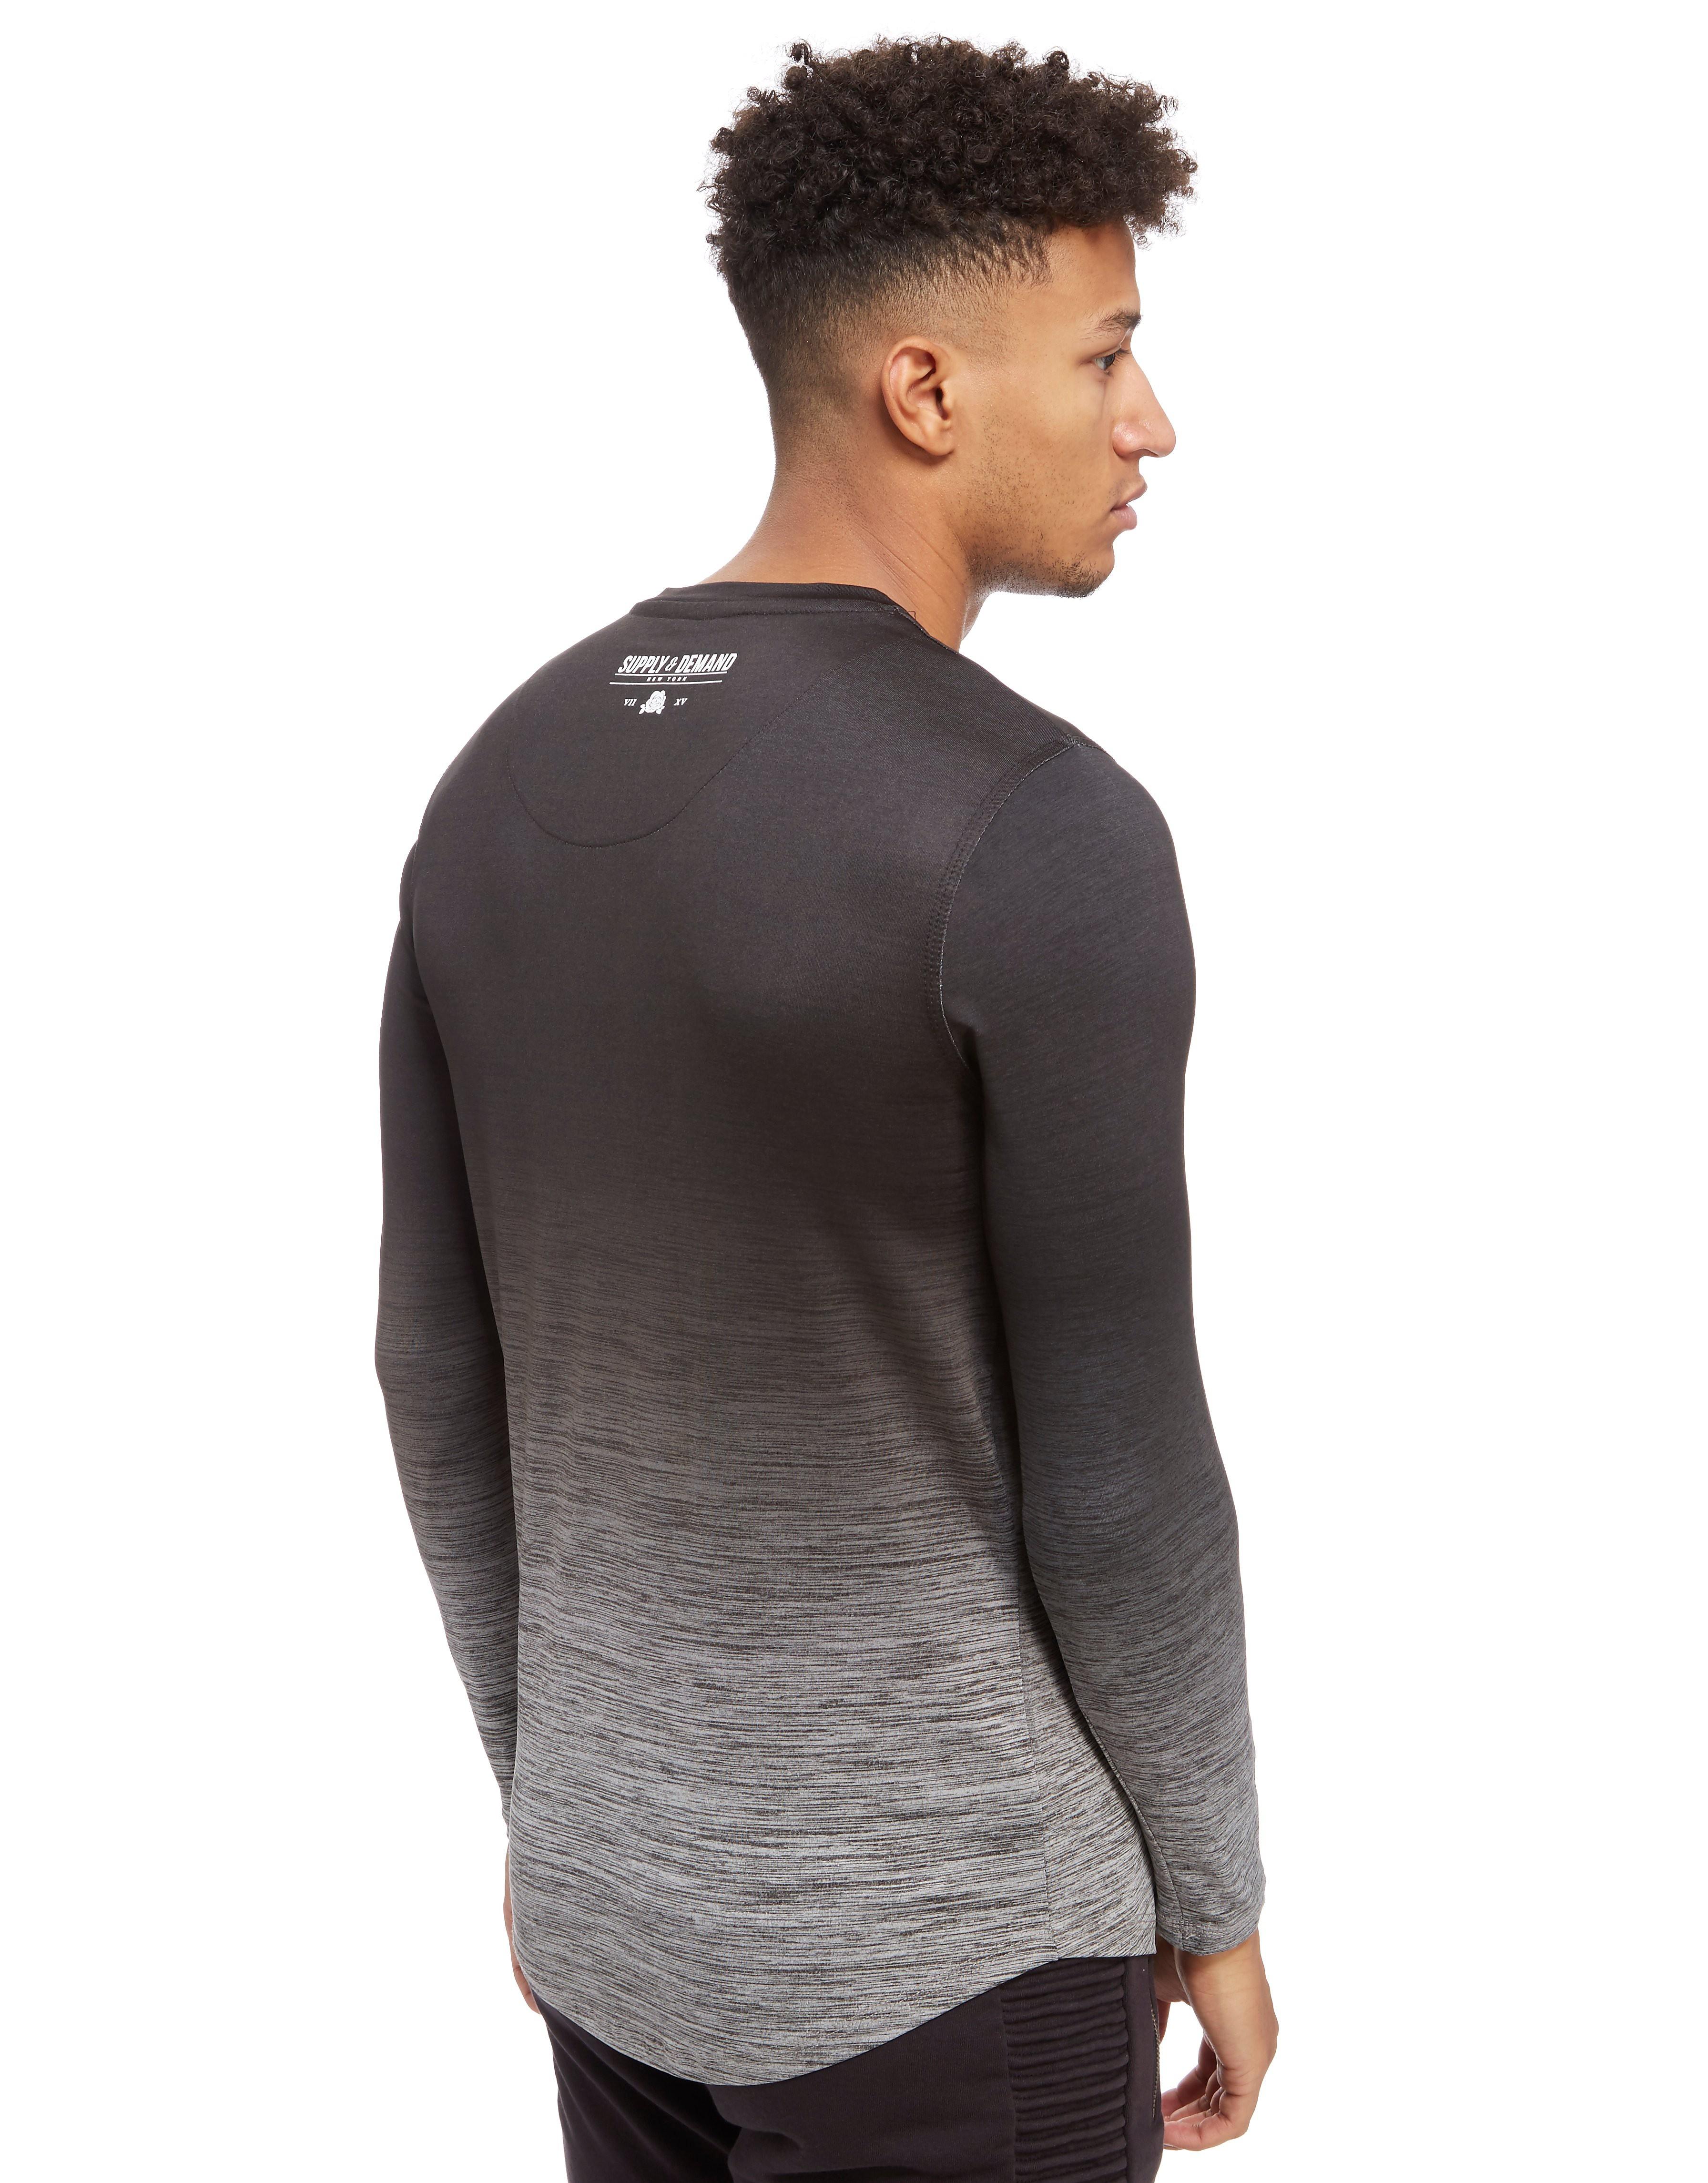 Supply & Demand Ignite Long-Sleeved T-Shirt